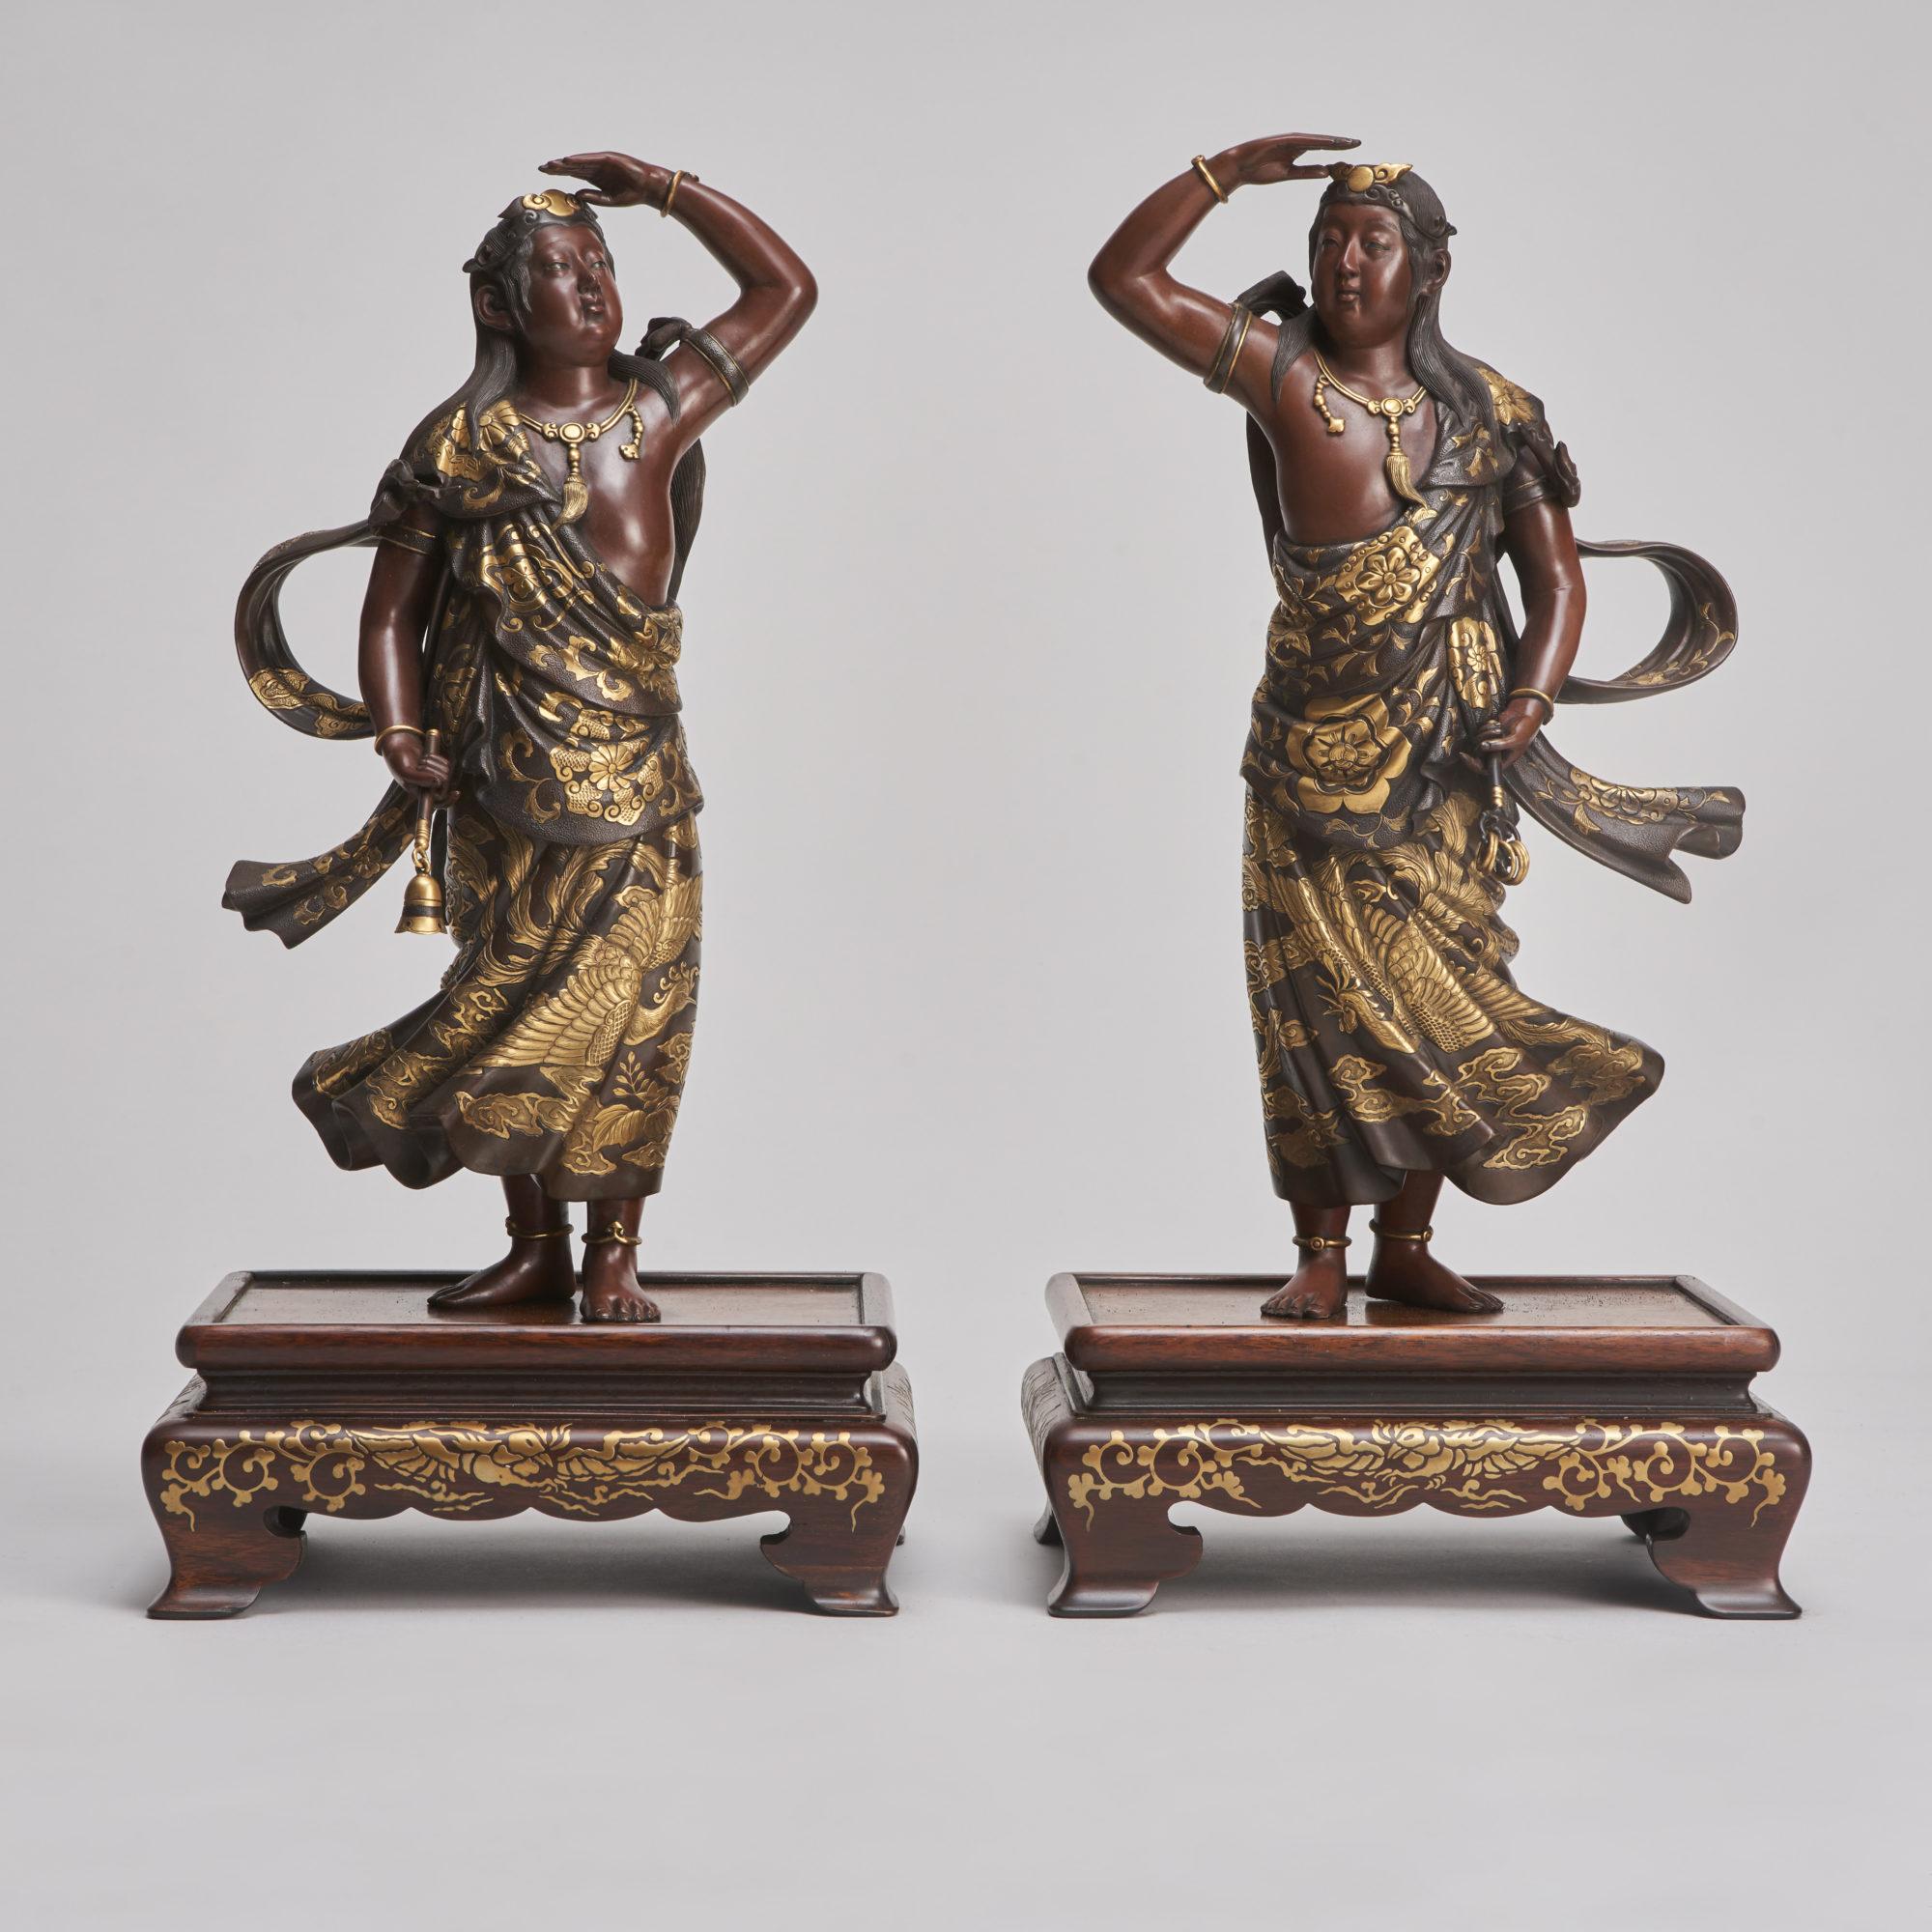 Miyao Okimono pair   A captivating and elegant pair of Japanese Bronze figures of Deities signed Miyao